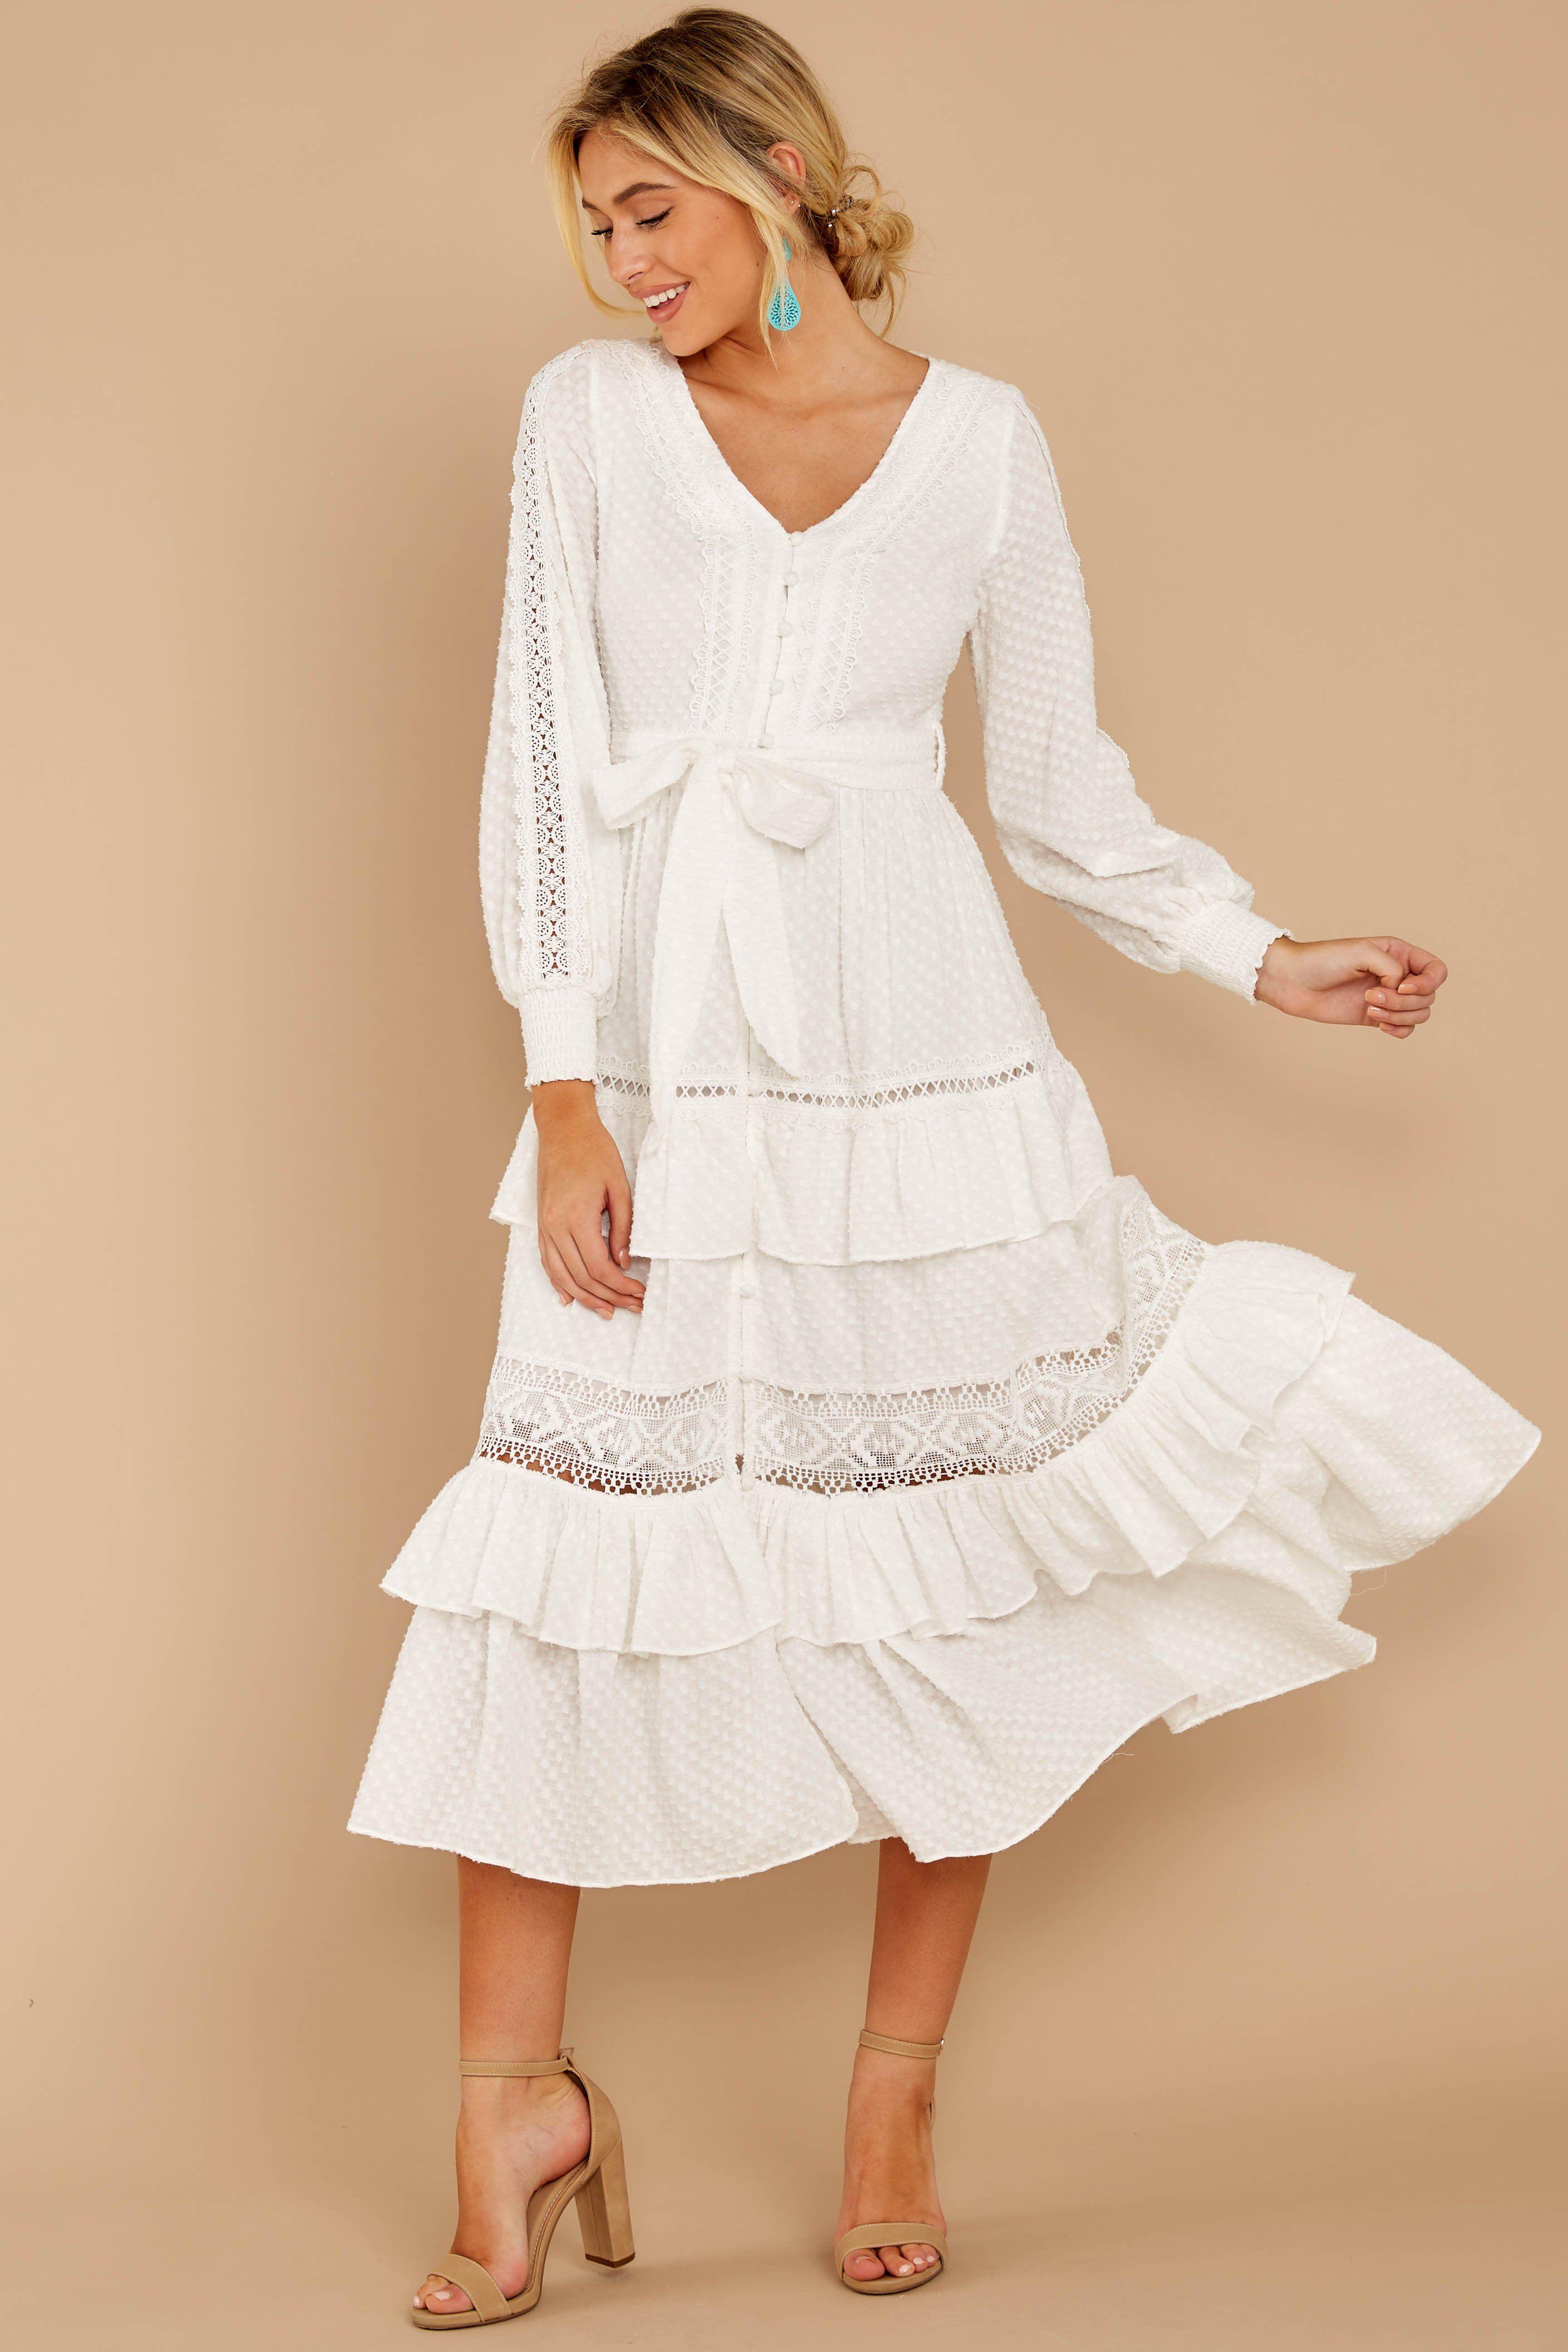 Elegant White Lace Midi Dress Flowy Tiered Lace Midi Dress 84 Red Dress White Lace Midi Dress Lace Dress Lace White Dress [ 4226 x 2818 Pixel ]